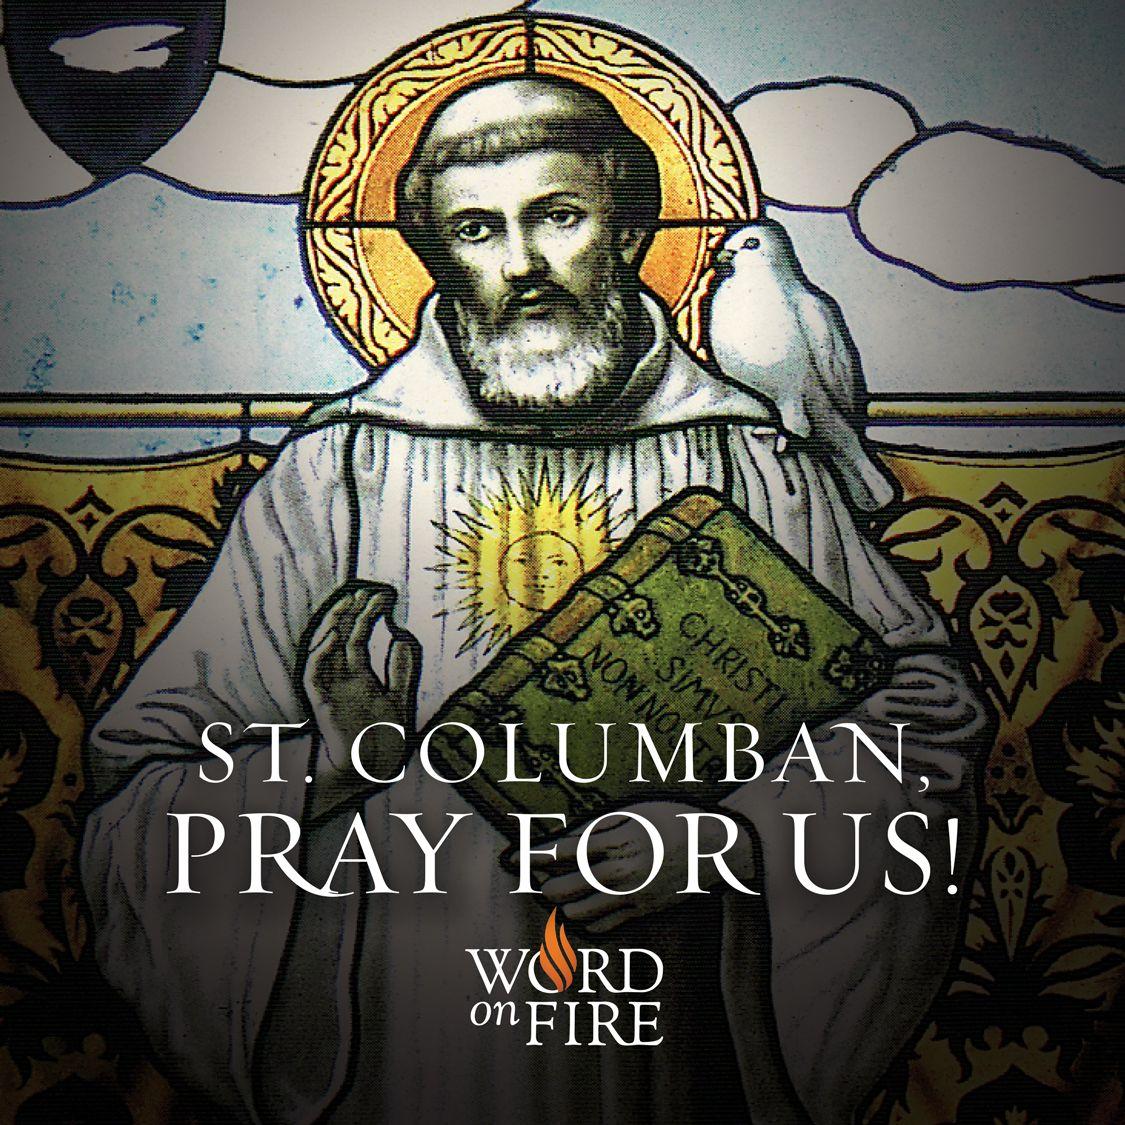 St. Columban, pray for us   Catholic pictures, Pray for us ...